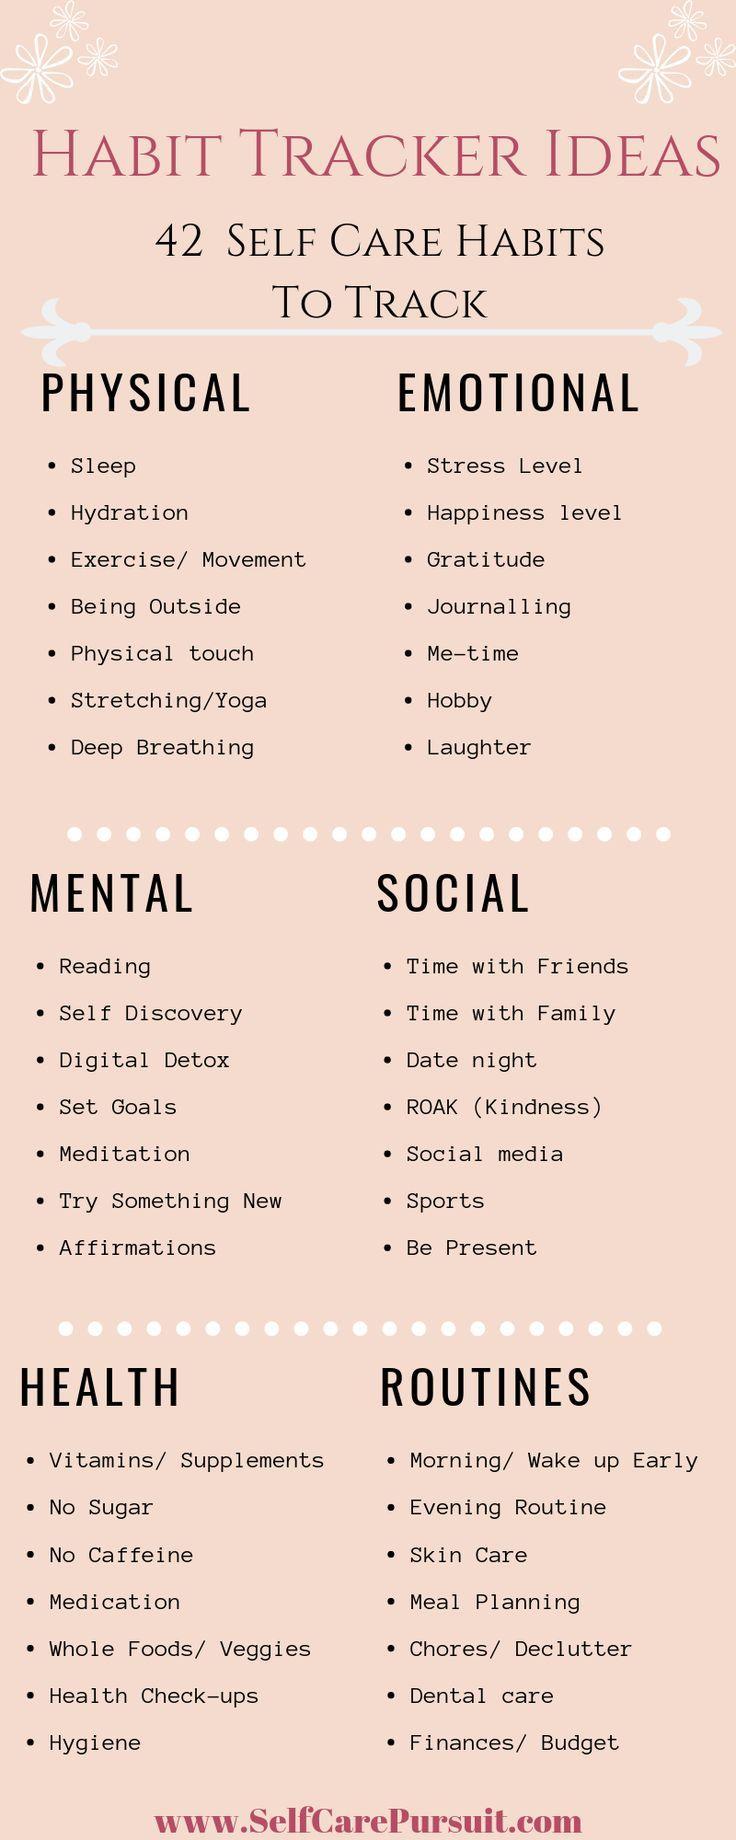 42 Habit Tracker Ideas to focus on Self Care – health-goals